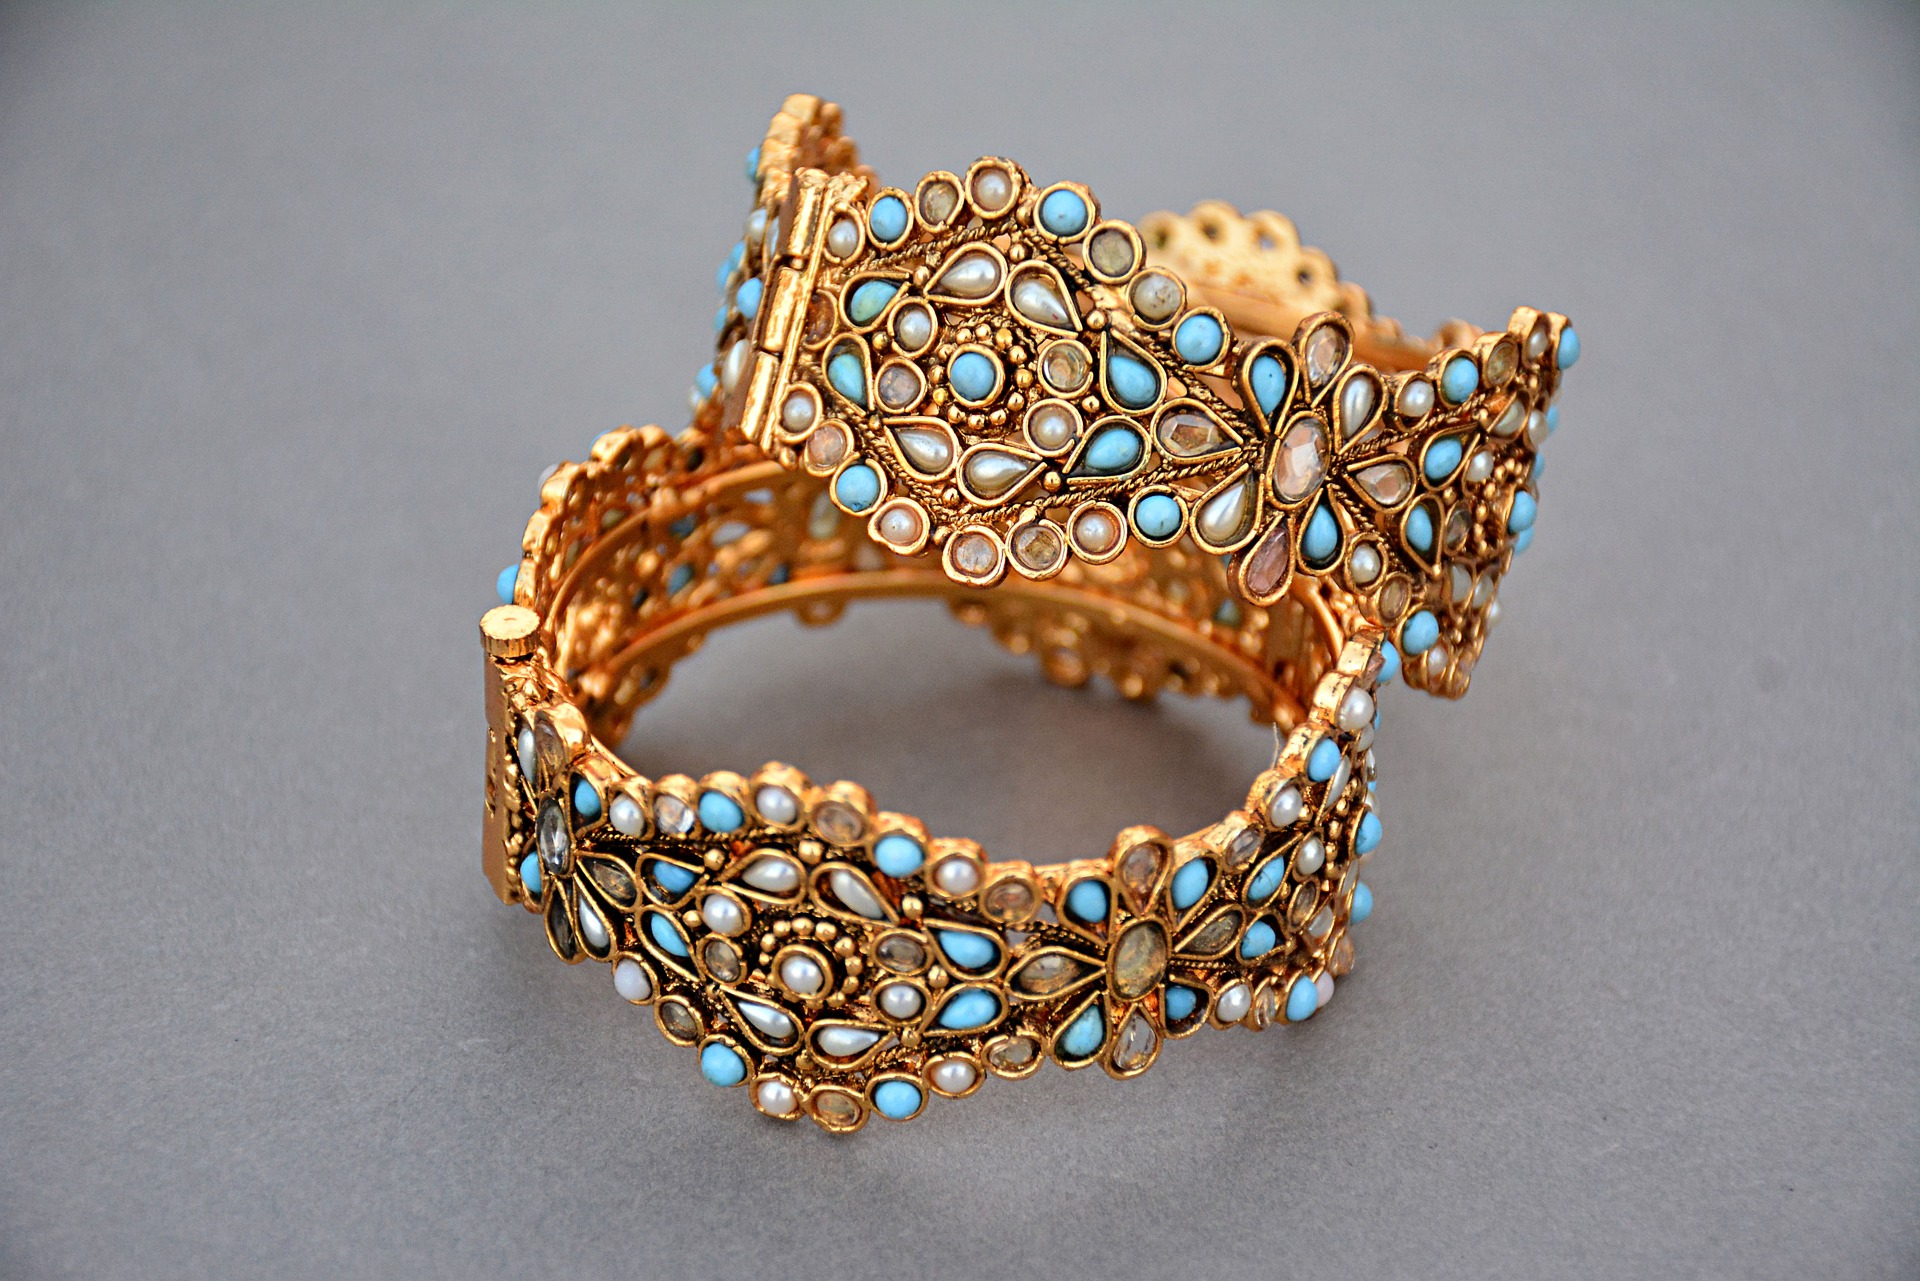 jewellery-1175533_1920.jpg